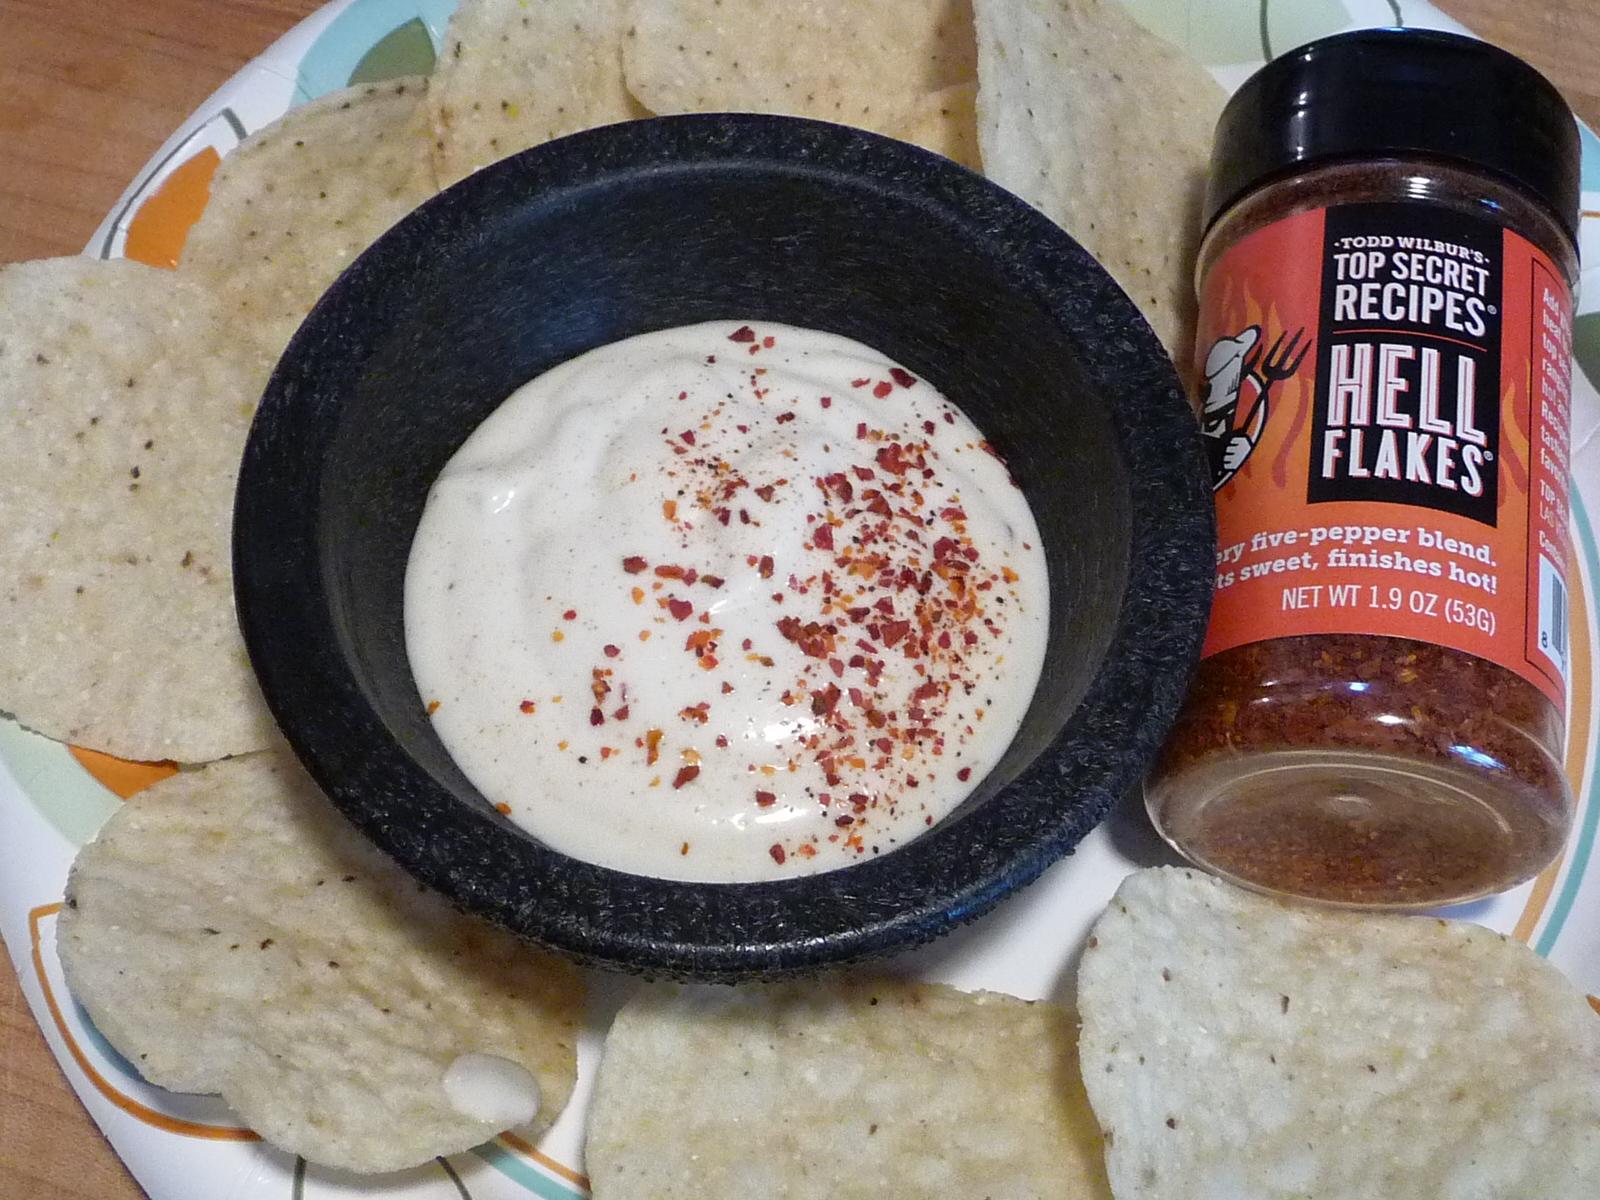 hell flakes on salsa blanco